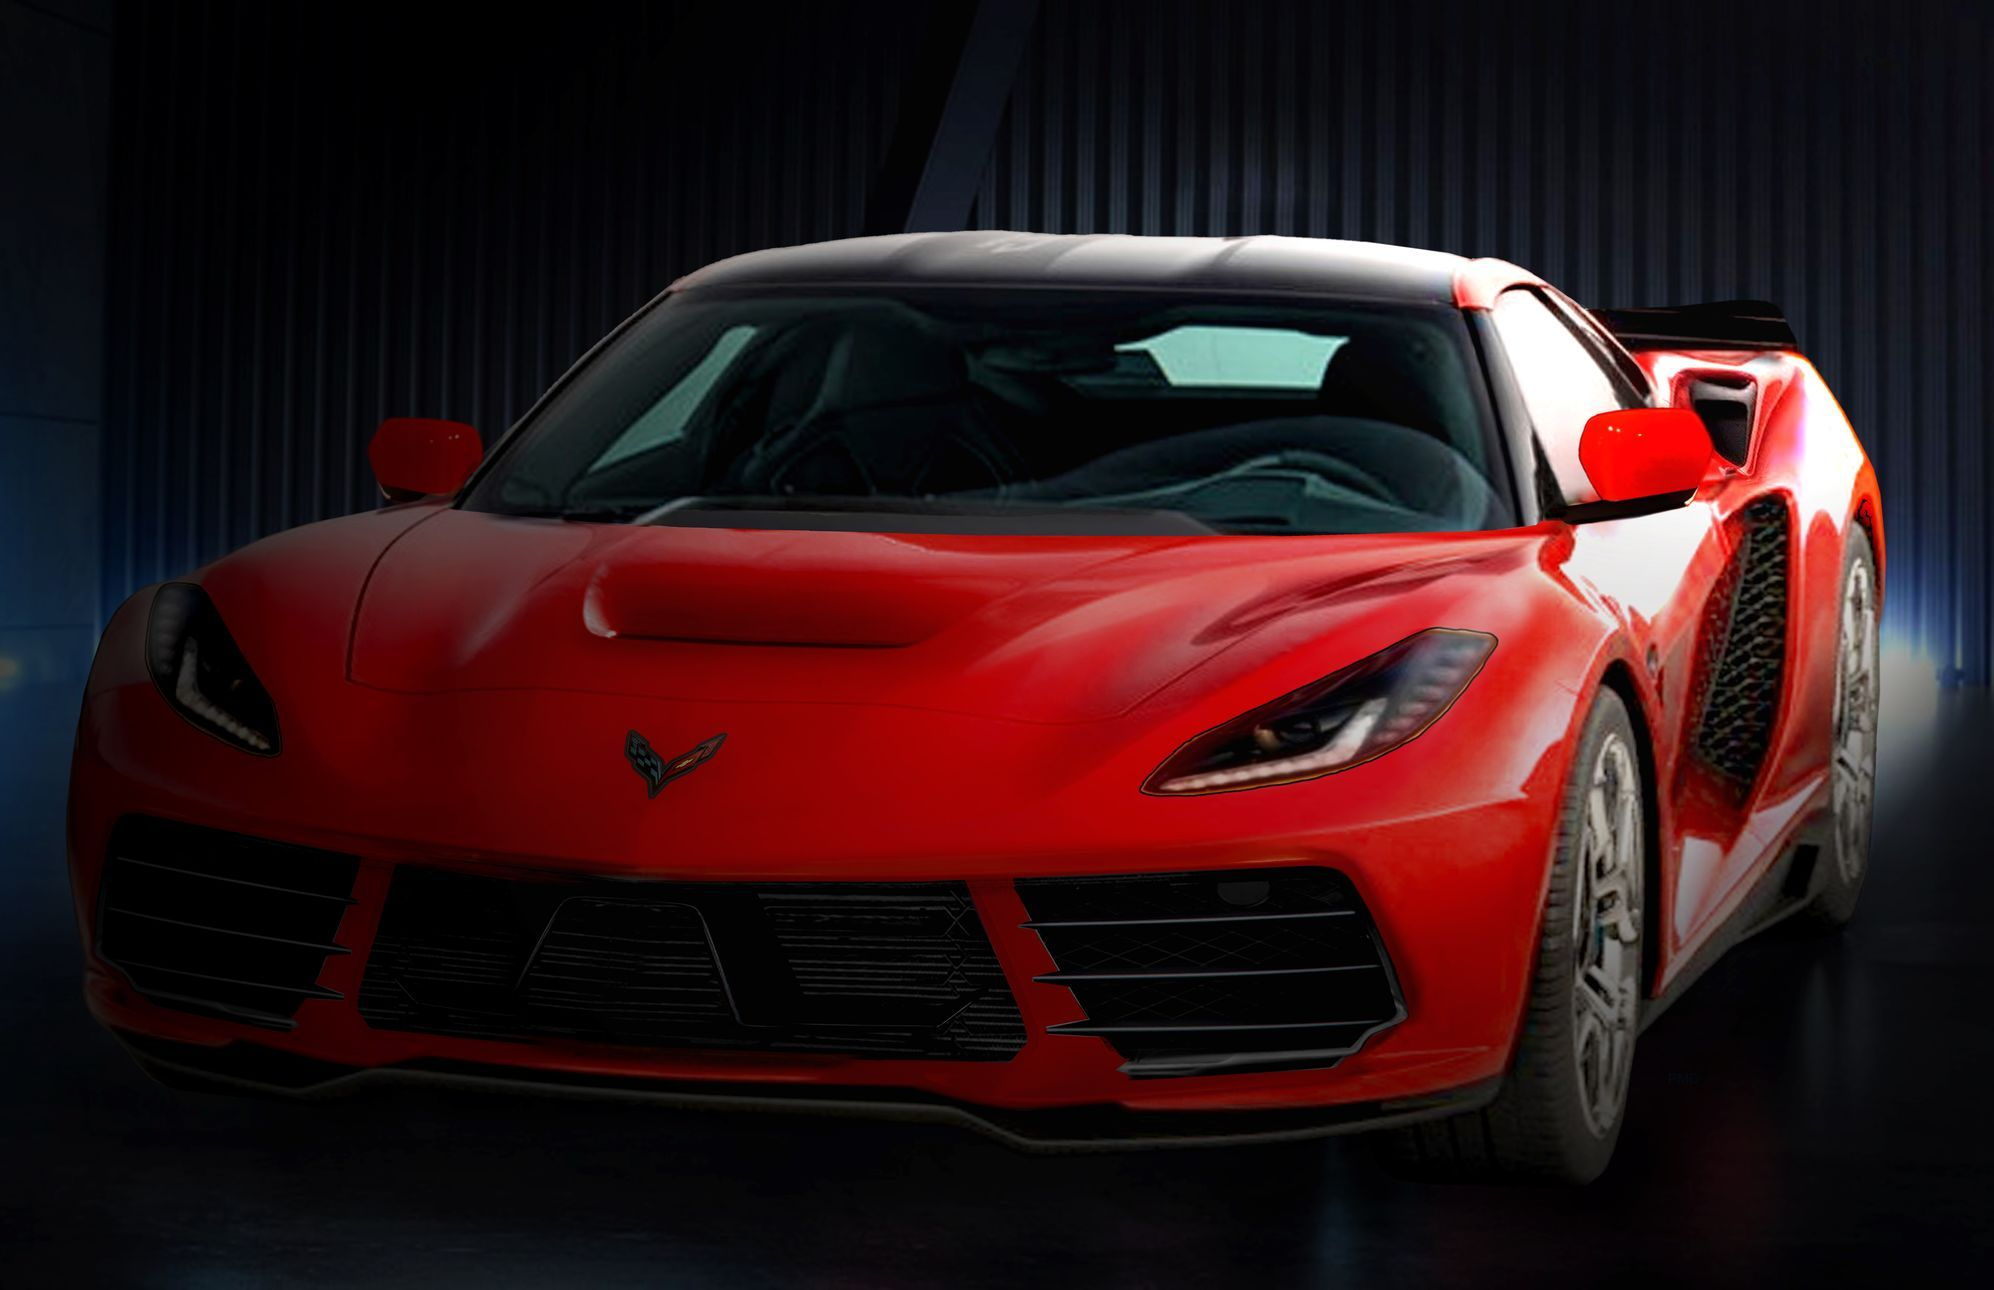 The 2020 Mid Engine Corvette Corvette